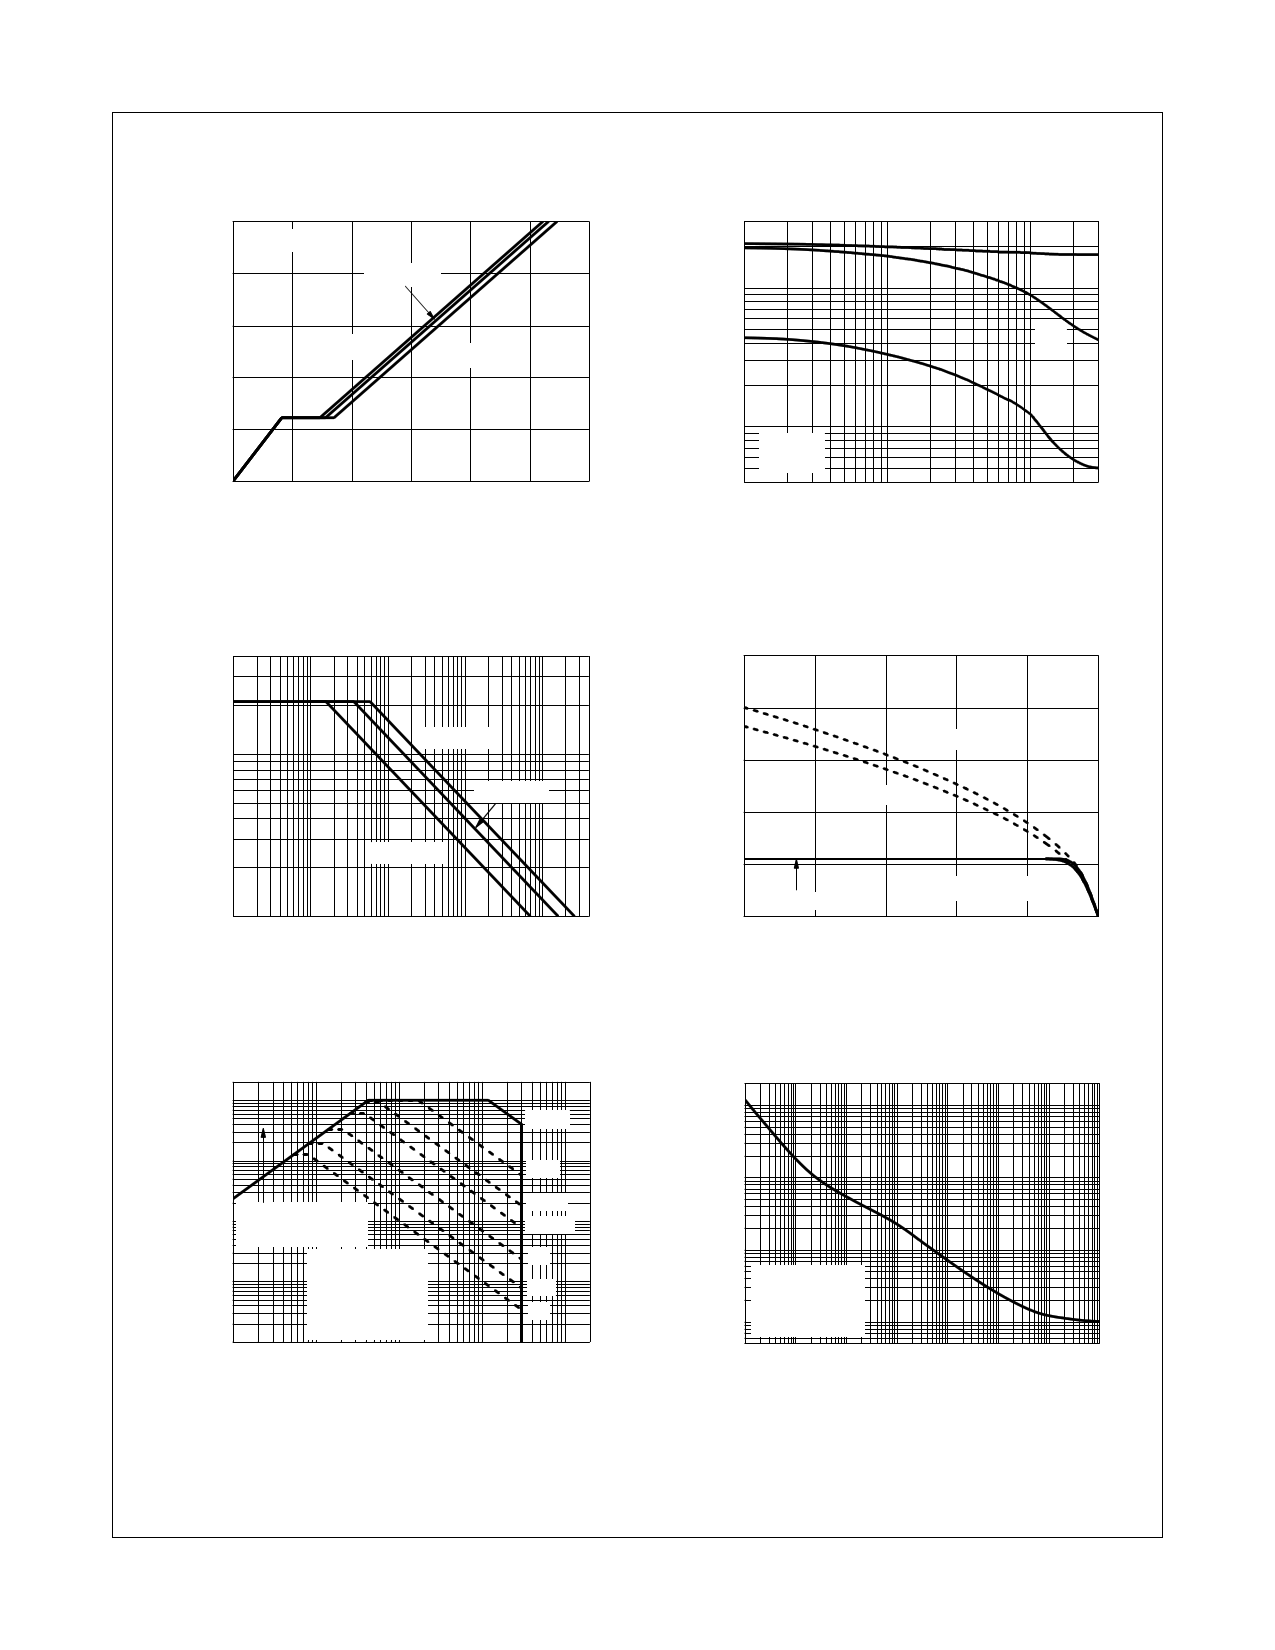 FDMS0310AS pdf, 반도체, 판매, 대치품